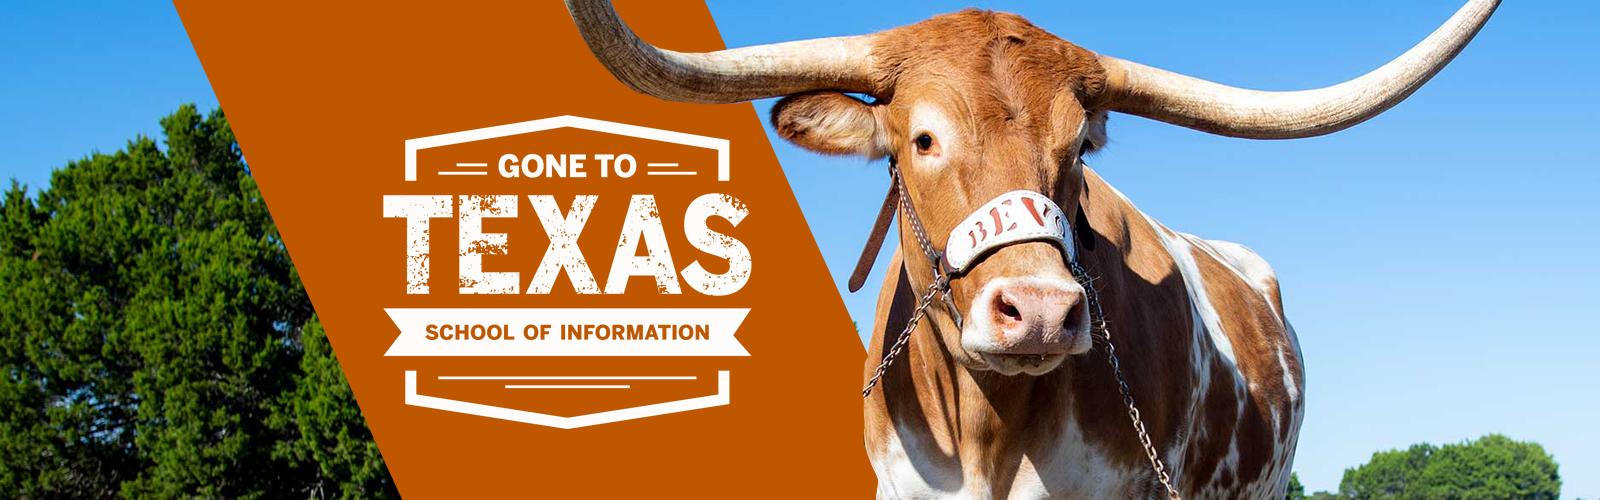 "Gone to Texas logo with UT longhorn mascot ""Bevo"""